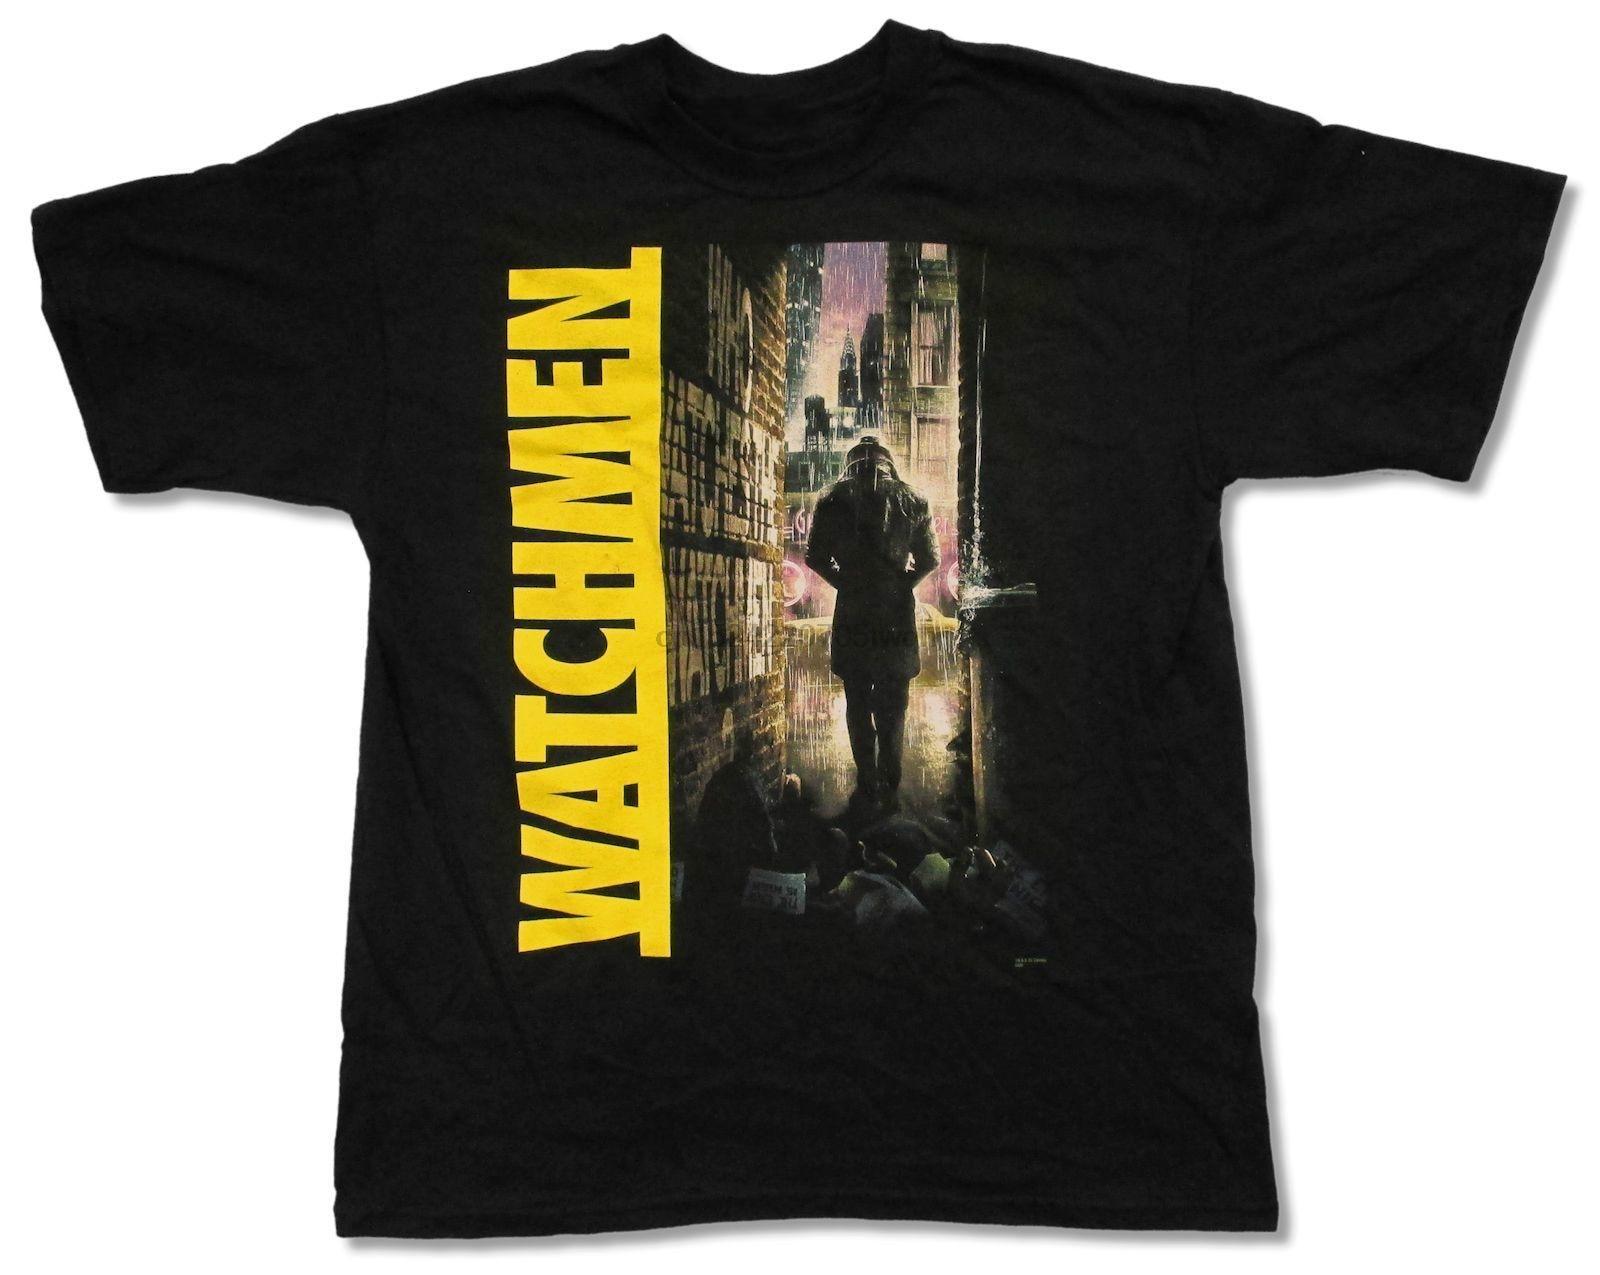 Tiger Army Claw Blk New T-shirt S-3xl Psychobilly Punk Rock Band Nick 13 Top T Shirt Custom Any Logo Size Design Tops 100% Guarantee Tops & Tees T-shirts